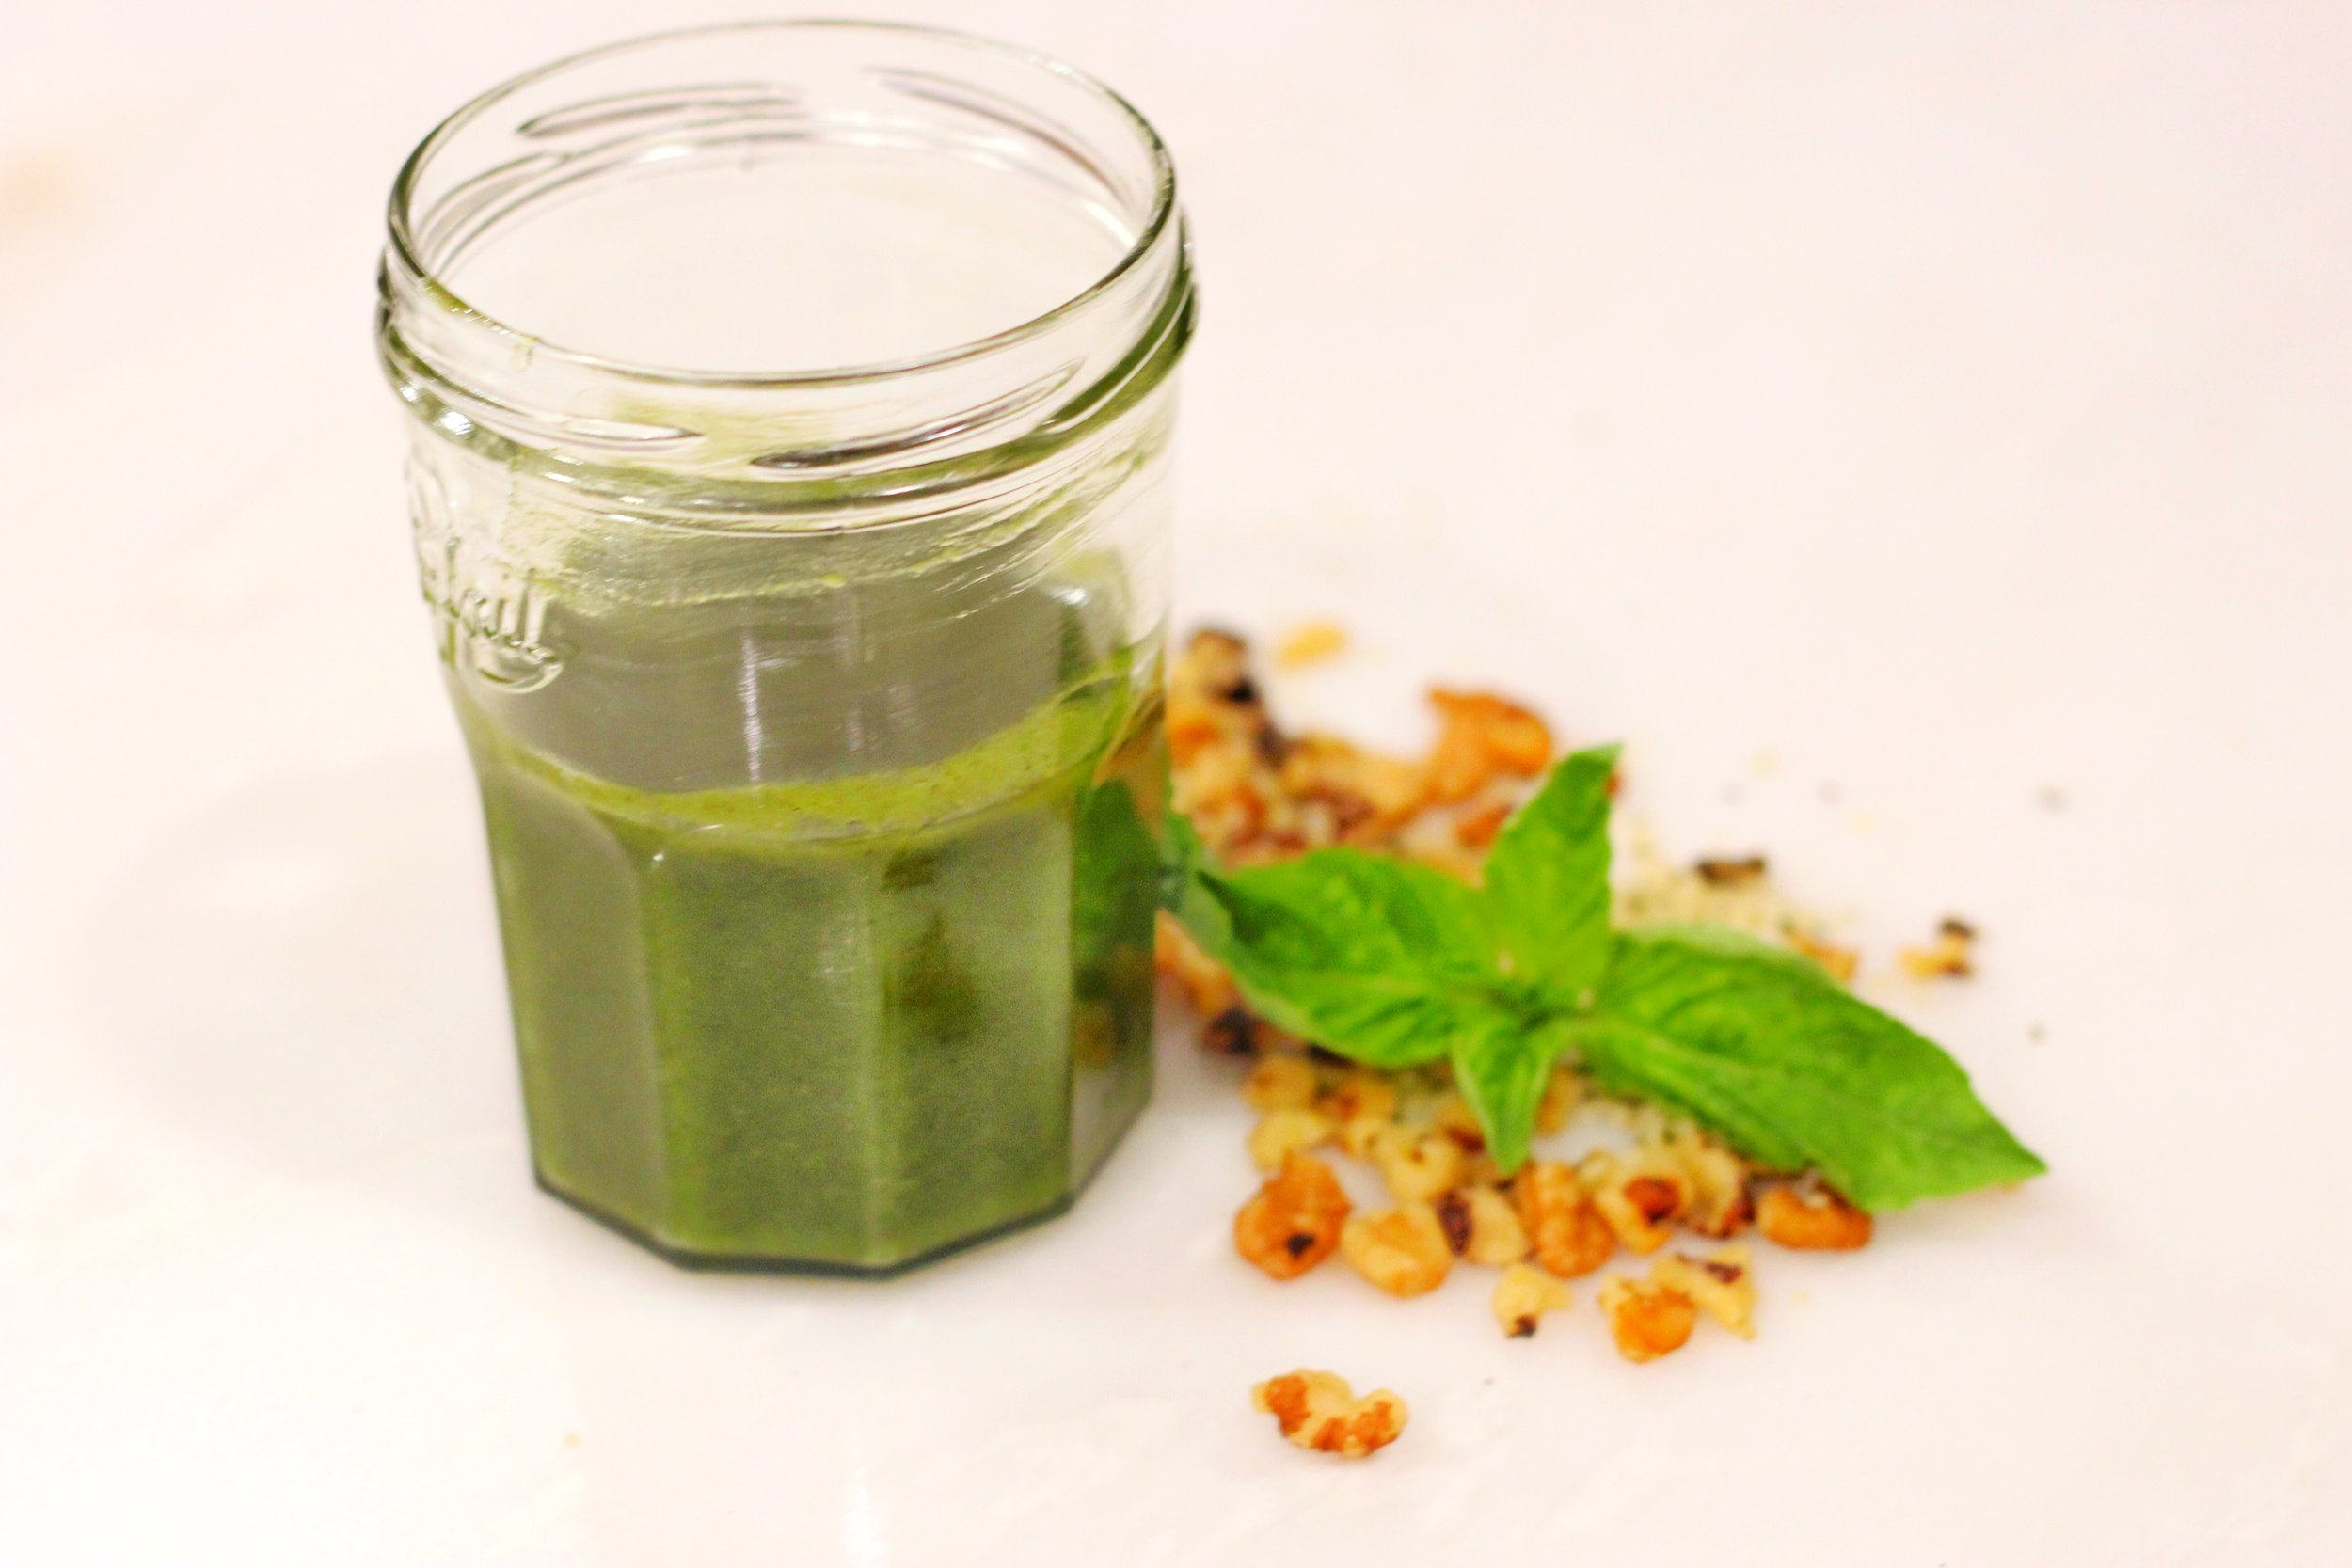 Pesto.jpg-dairy-free-pesto-flavor-clean-eating-sauces